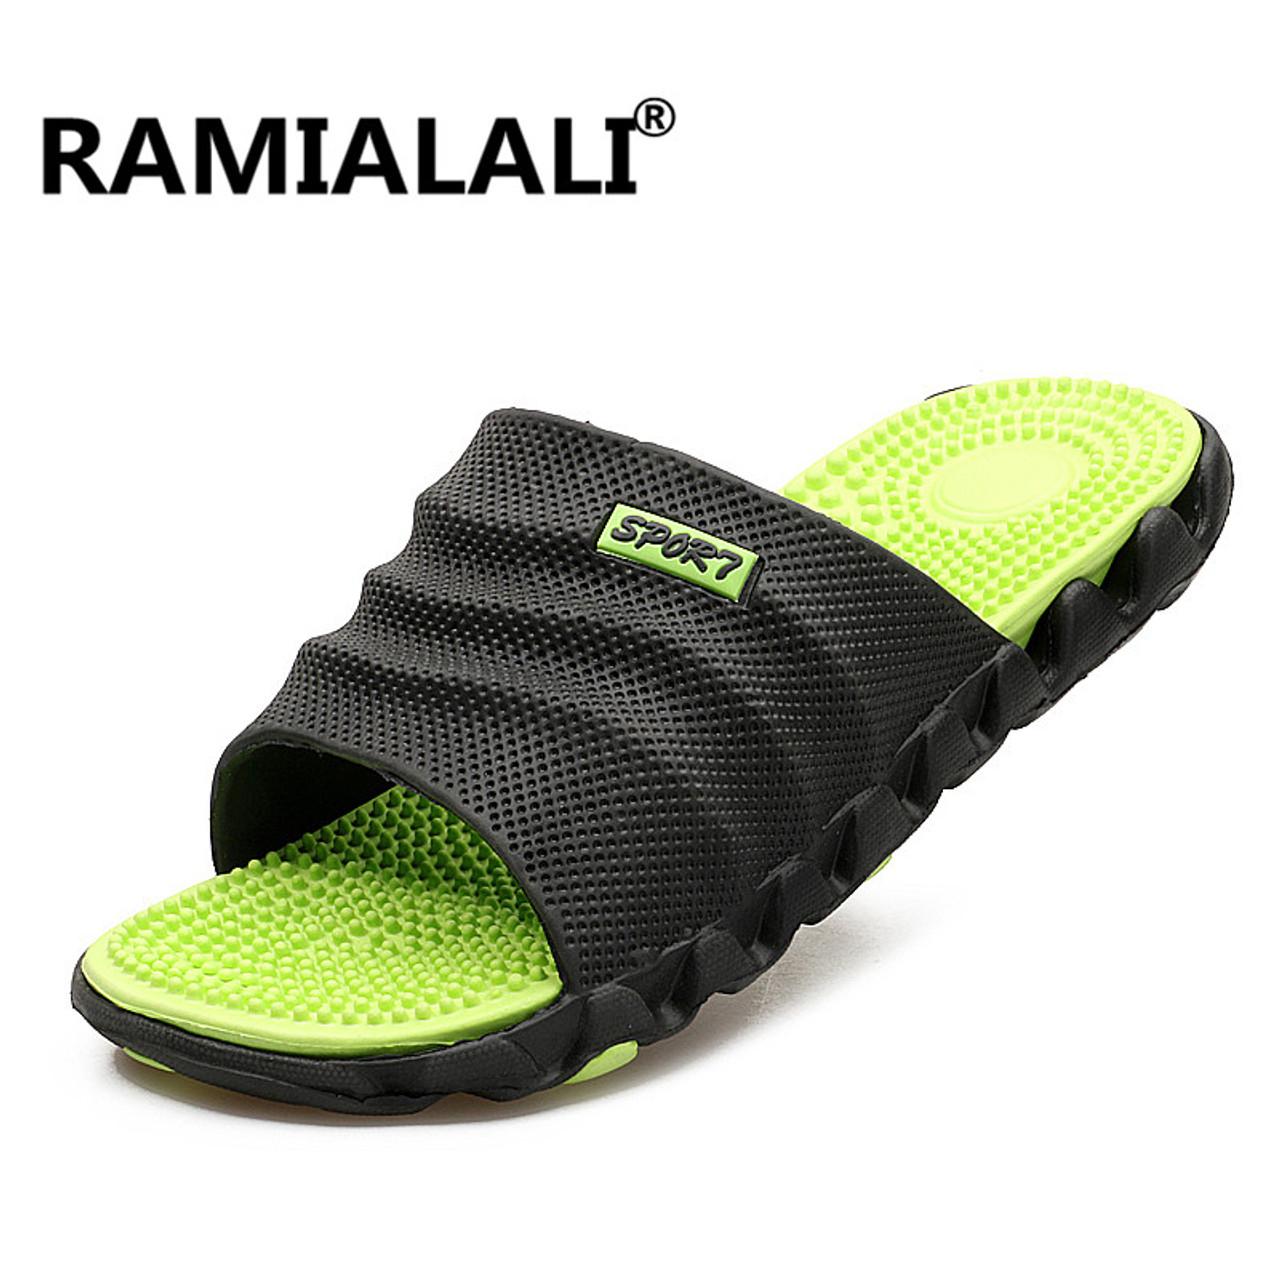 f29da90931 ... Ramialali Summer Slippers Men Casual Sandals Leisure Soft Slides Eva  Massage Beach Slippers Water Shoes Men's ...